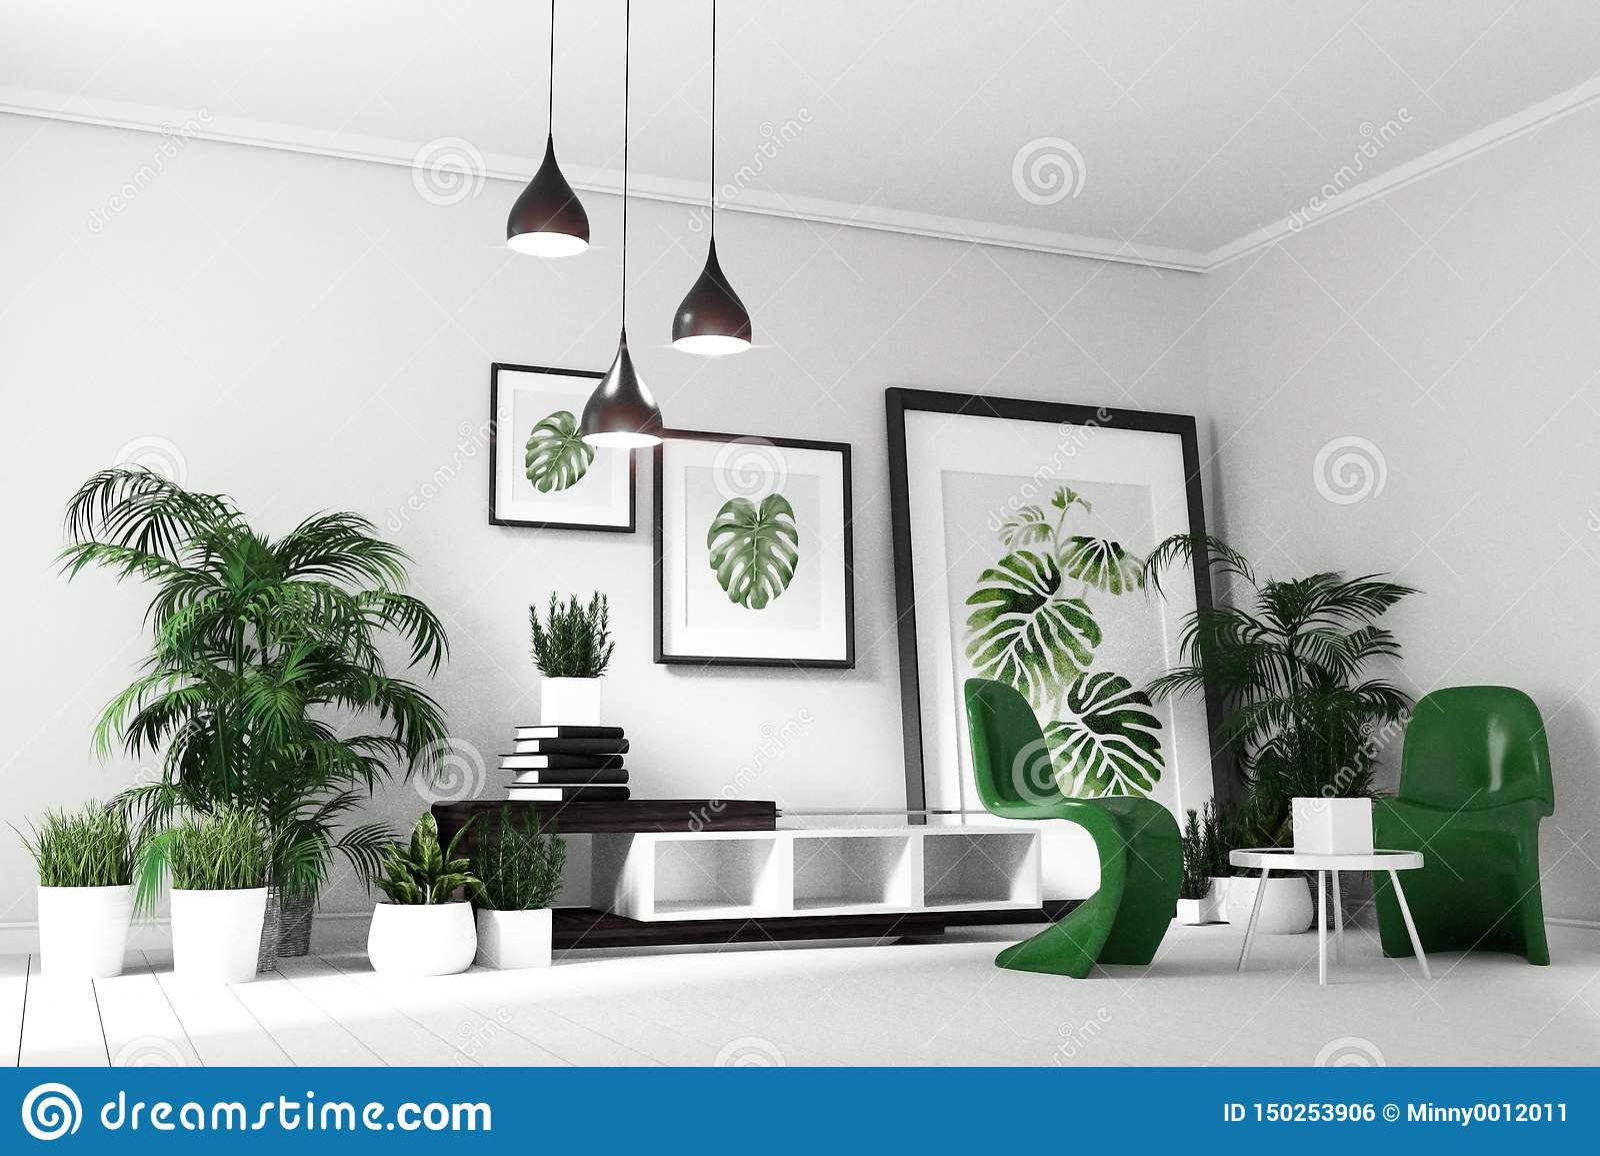 Scandinavian Living Room Interior Room Modern Tropical